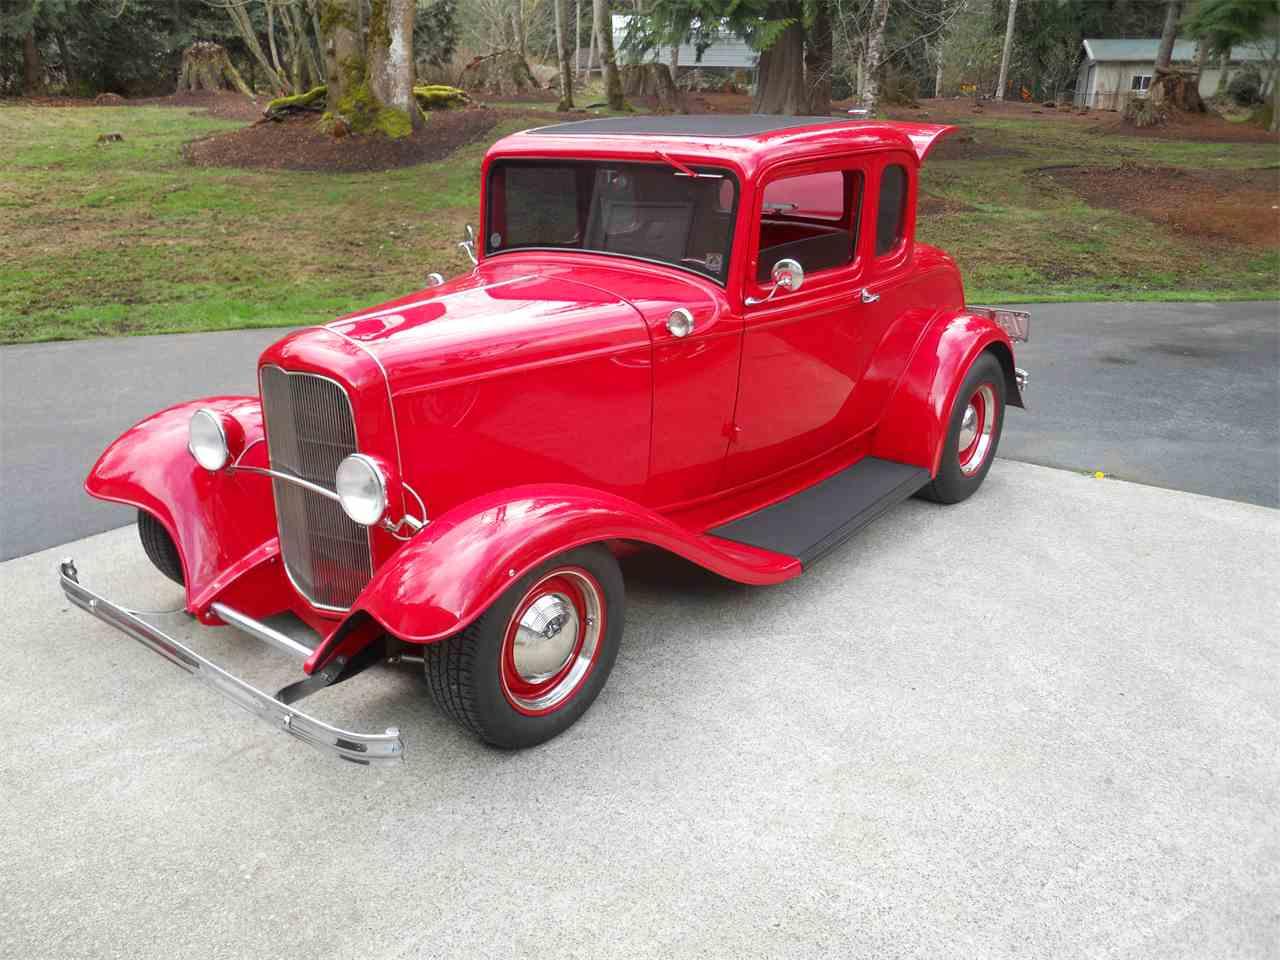 1932 Ford Street Rod for Sale   ClassicCars.com   CC-1068775